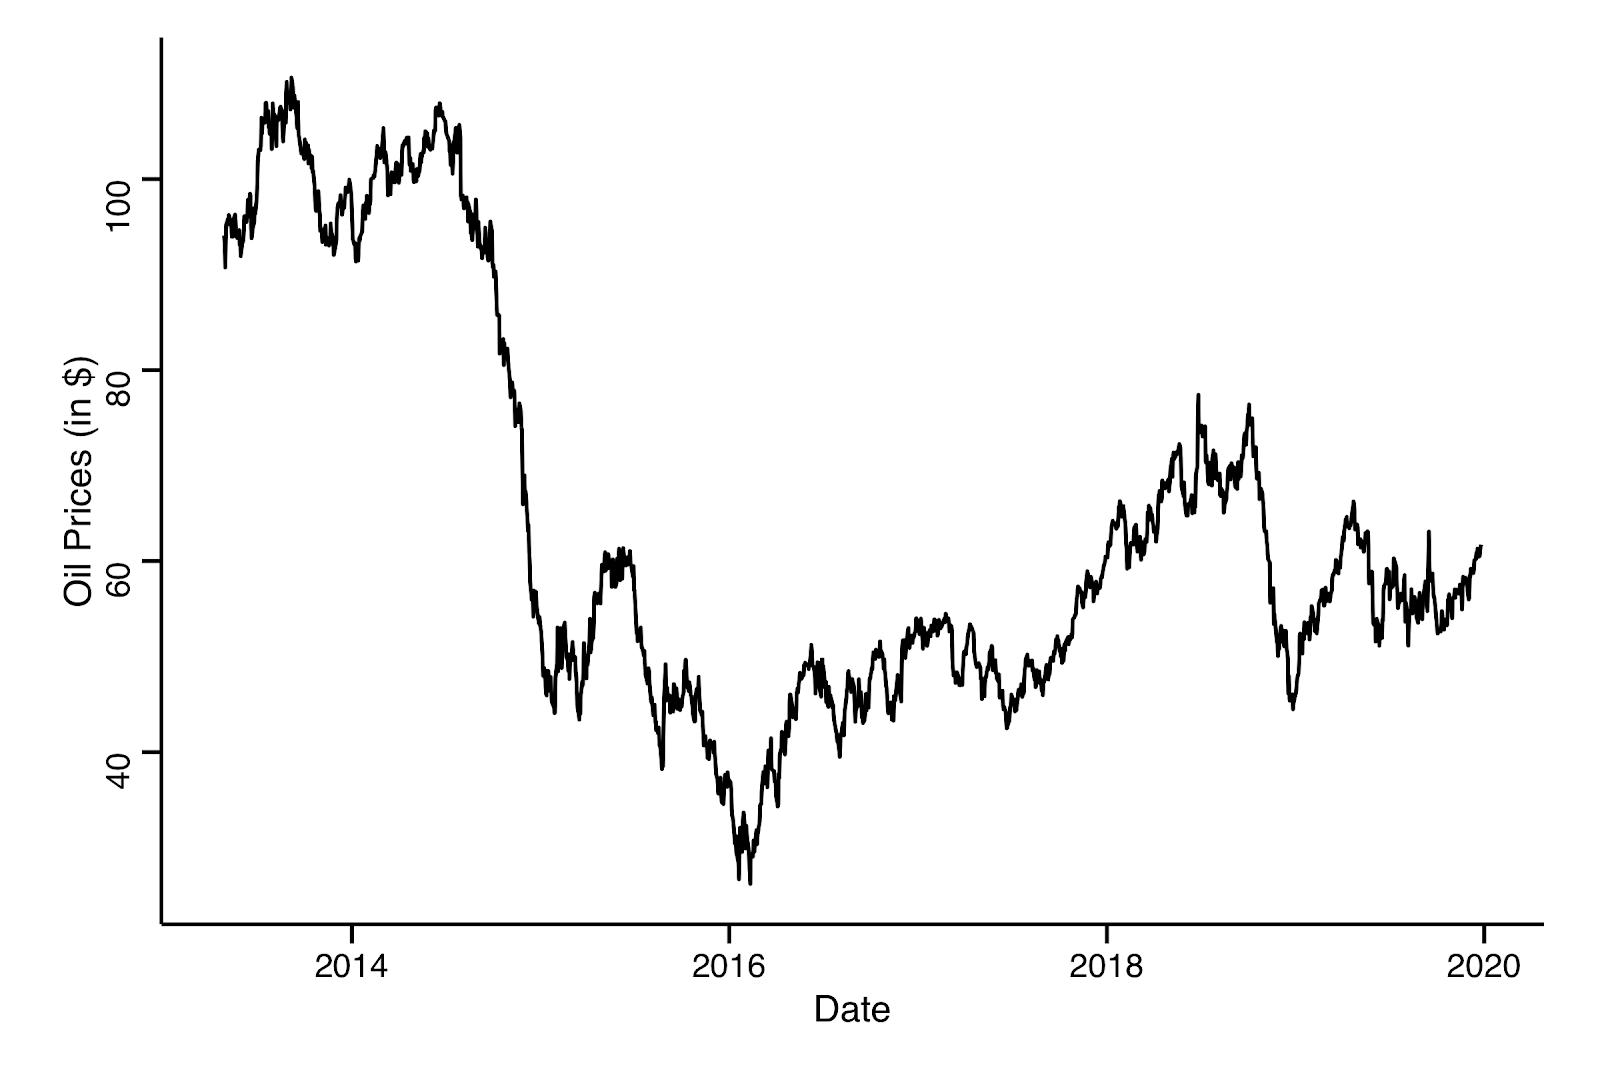 Figure 5: WTI Oil Prices from April 2013 until Dec. 25, 2019